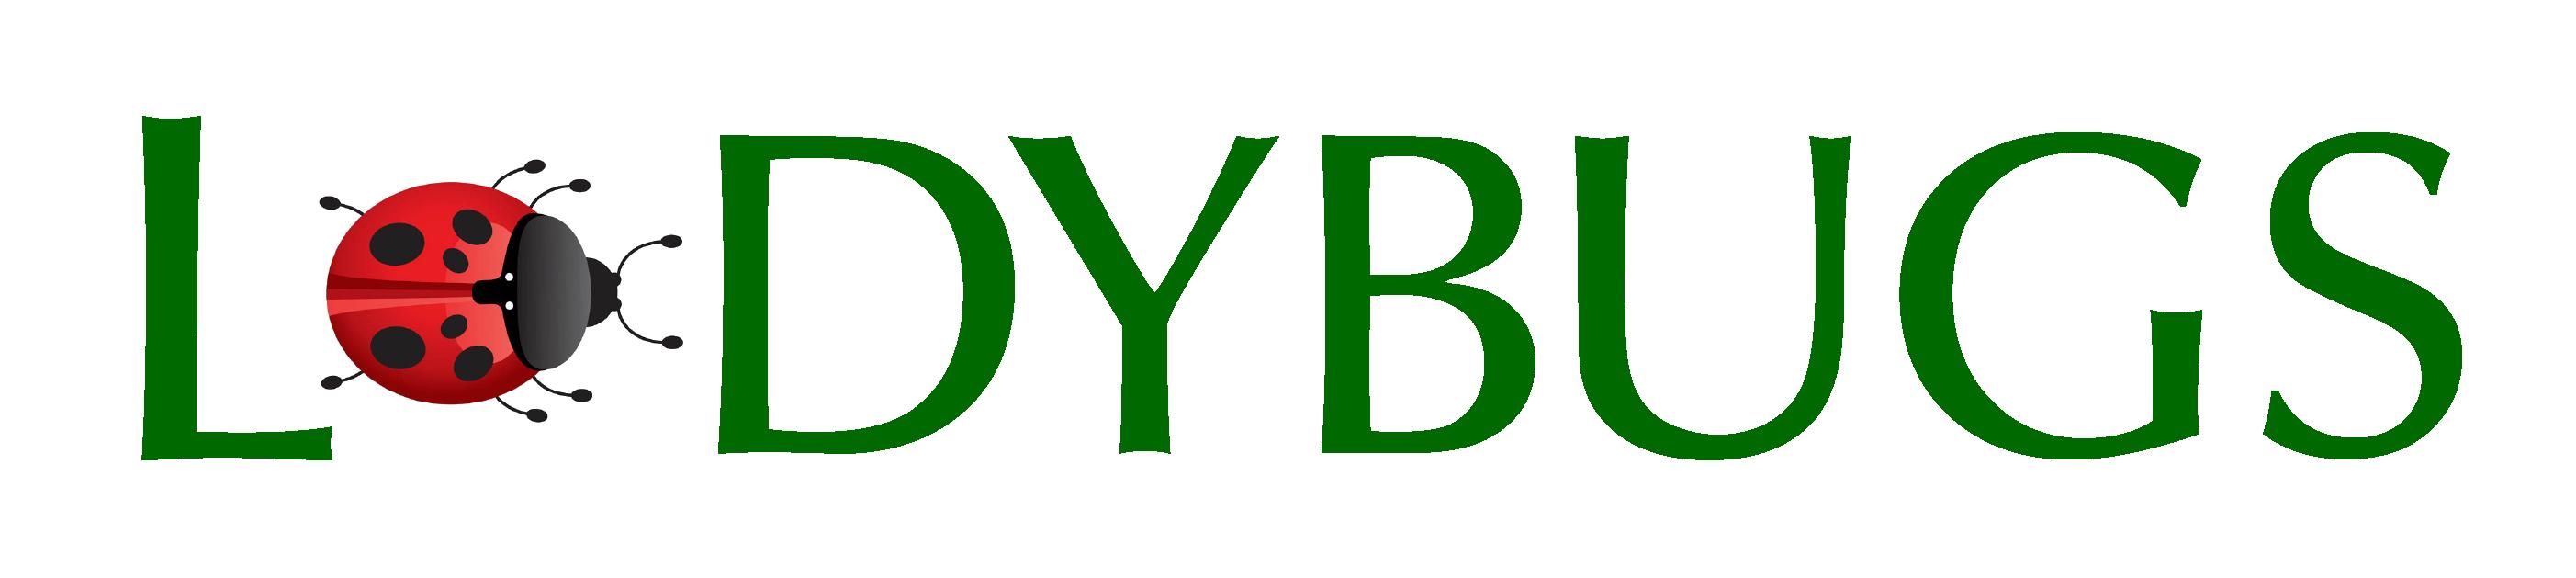 jeneene logo-01